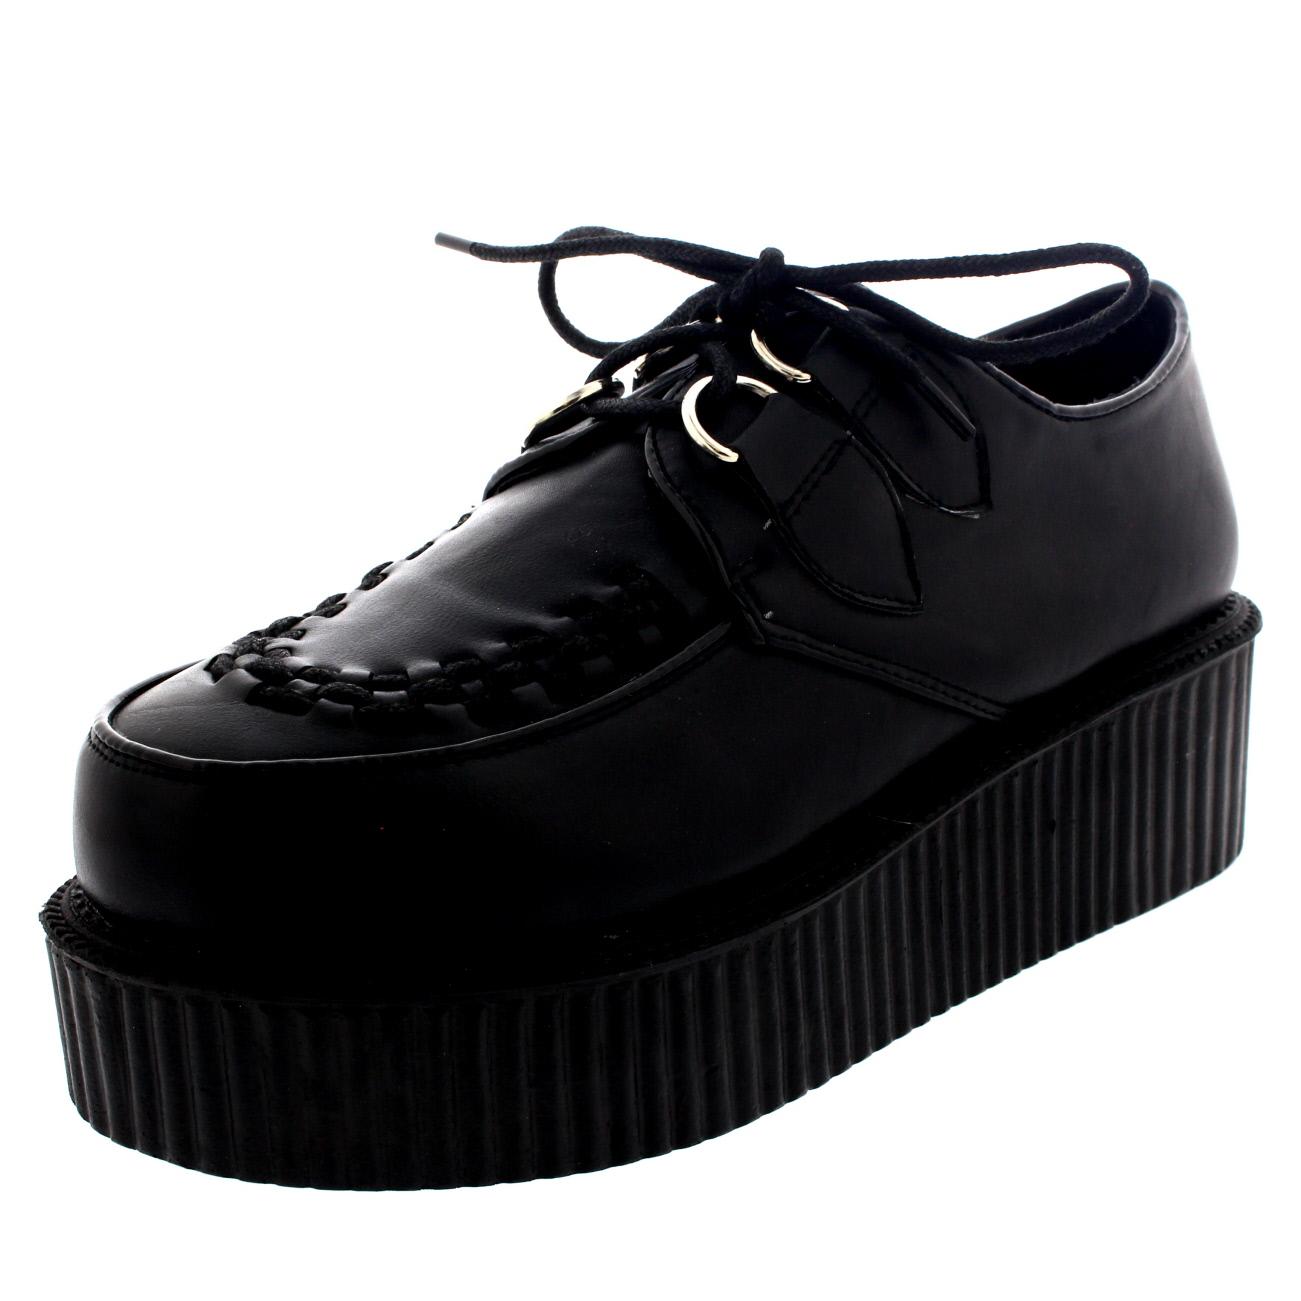 84a8d040a151 Womens Double Platform Retro Punk Festival Rock Brothel Creepers Shoes UK 3- 9